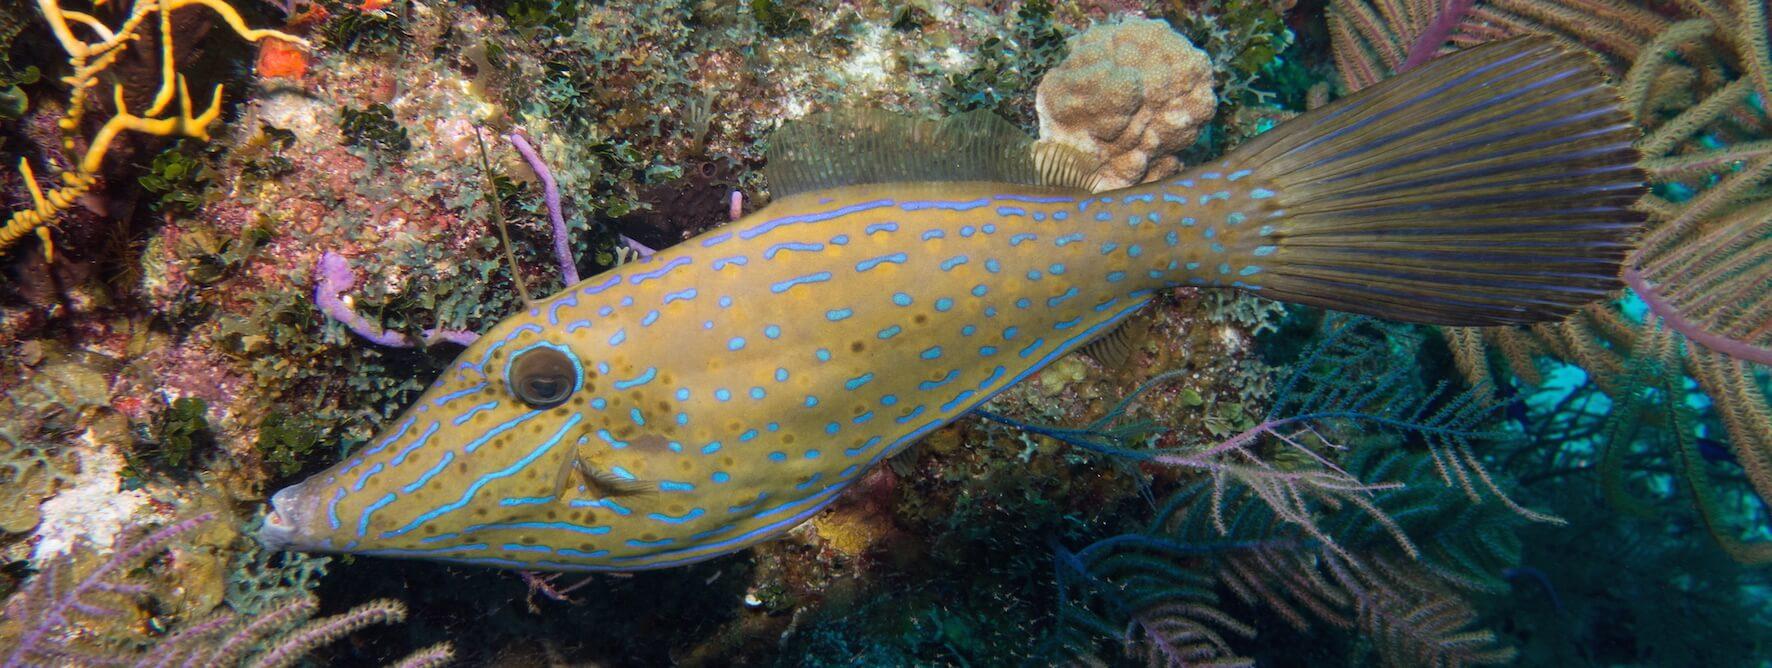 Scuba Travel, Scrawled Filefish